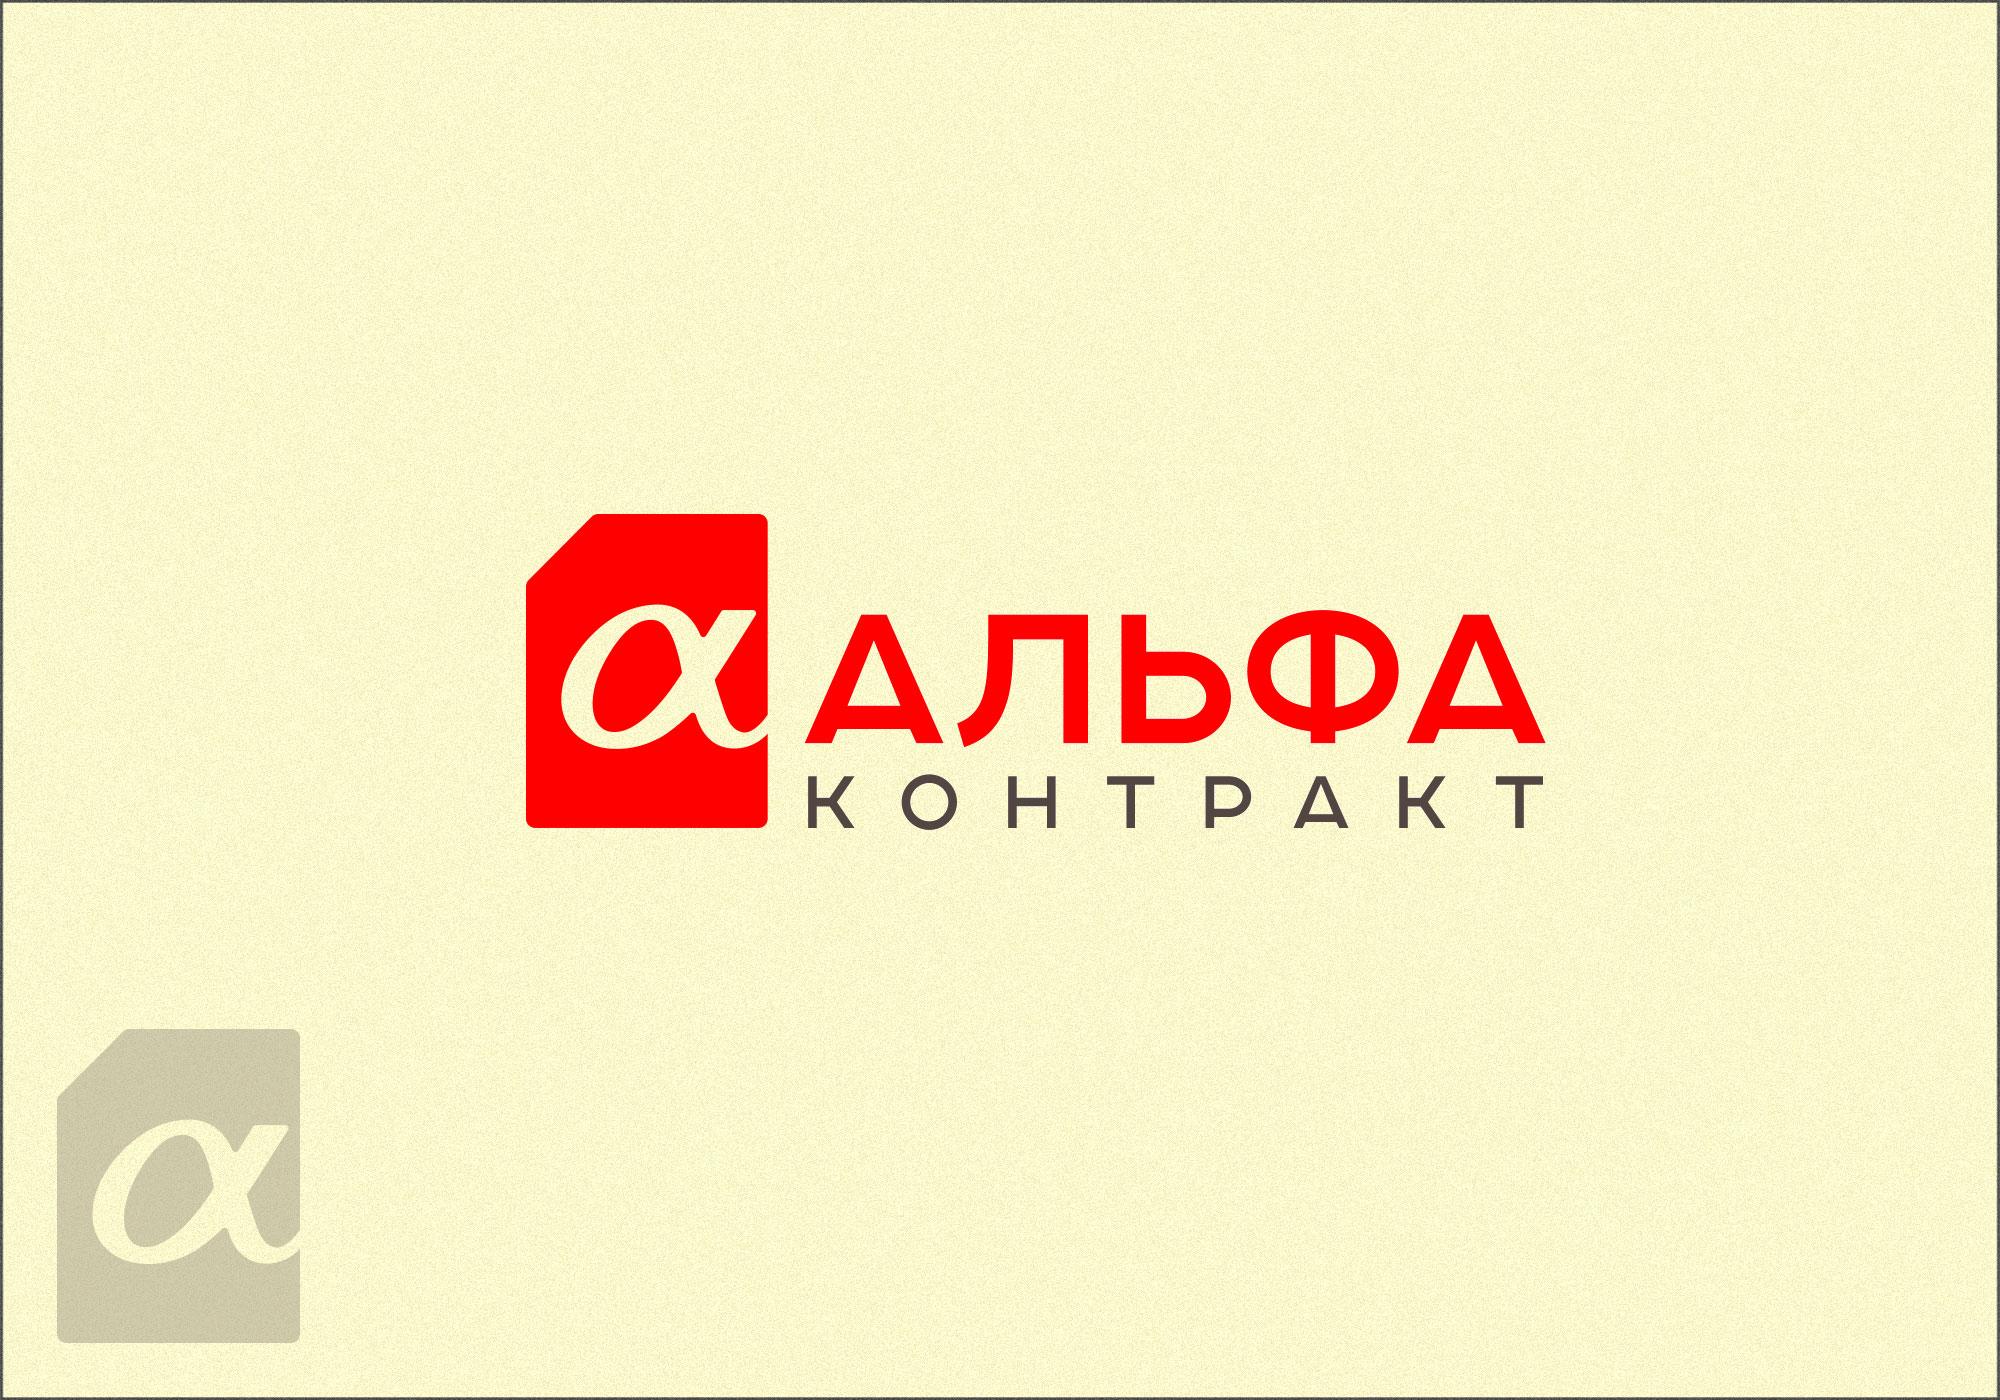 Дизайнер для разработки логотипа компании фото f_0965bf95c121a155.jpg